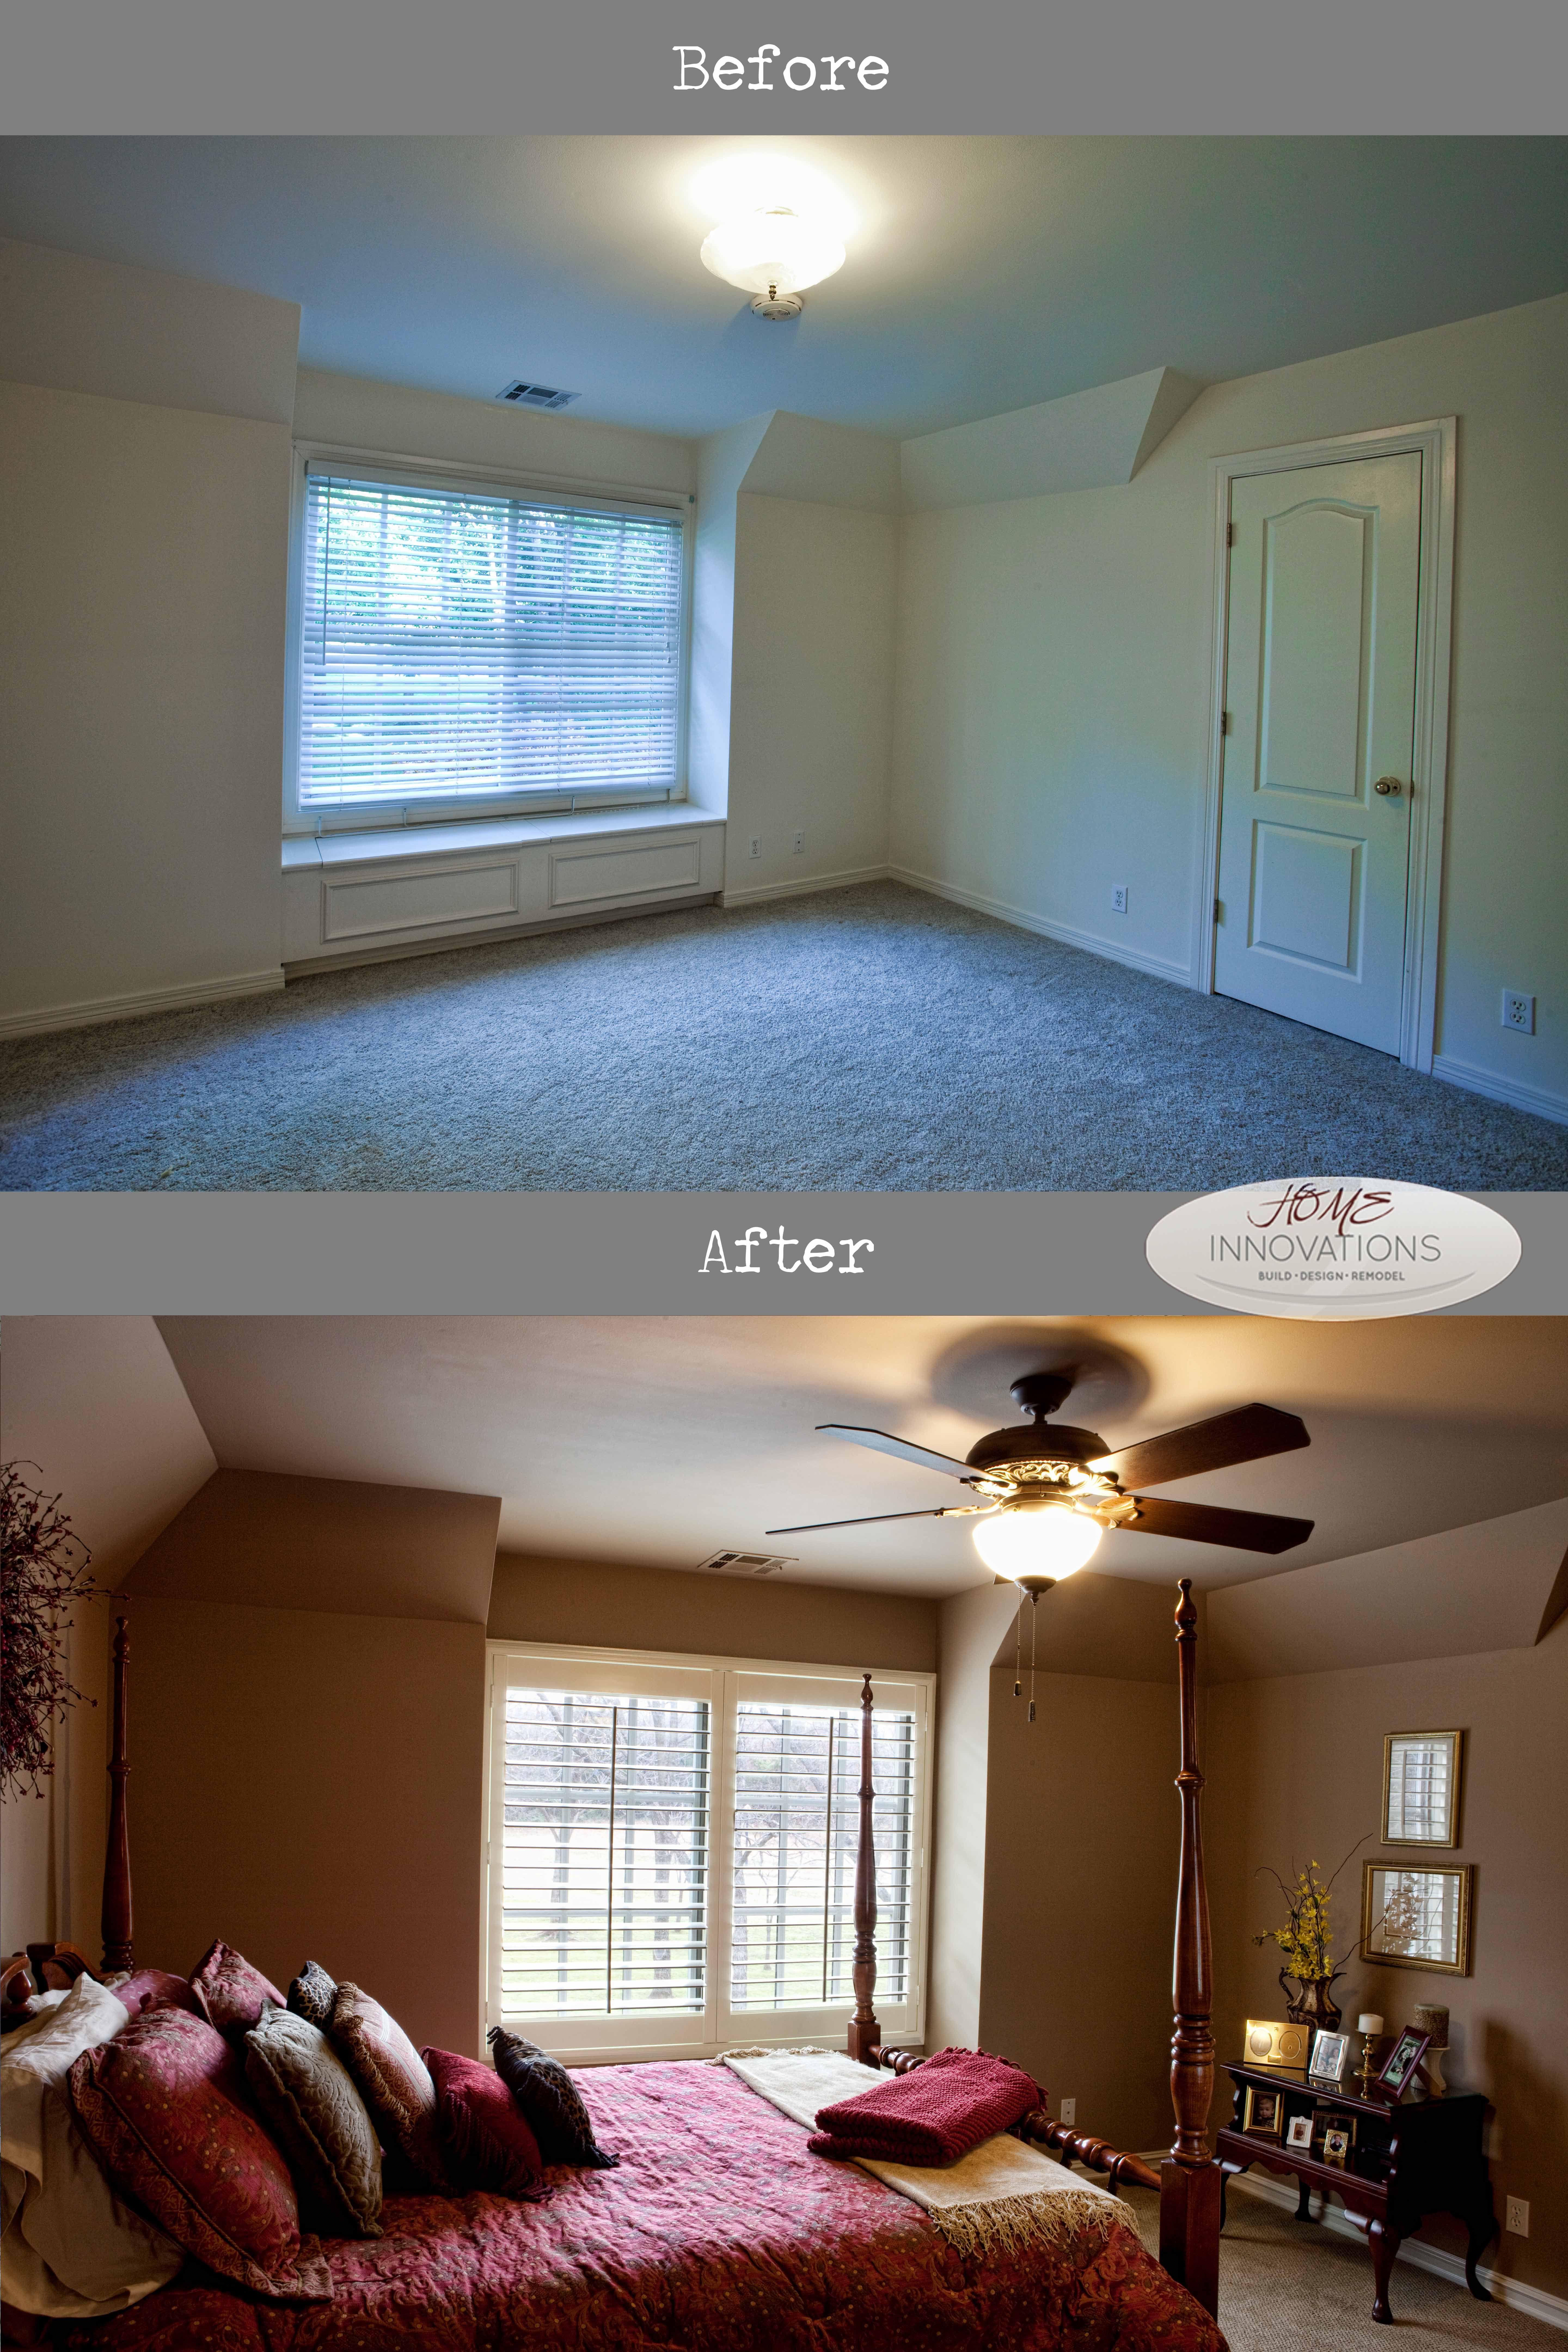 Sherwin williams dormer brown bedroom my style pinterest